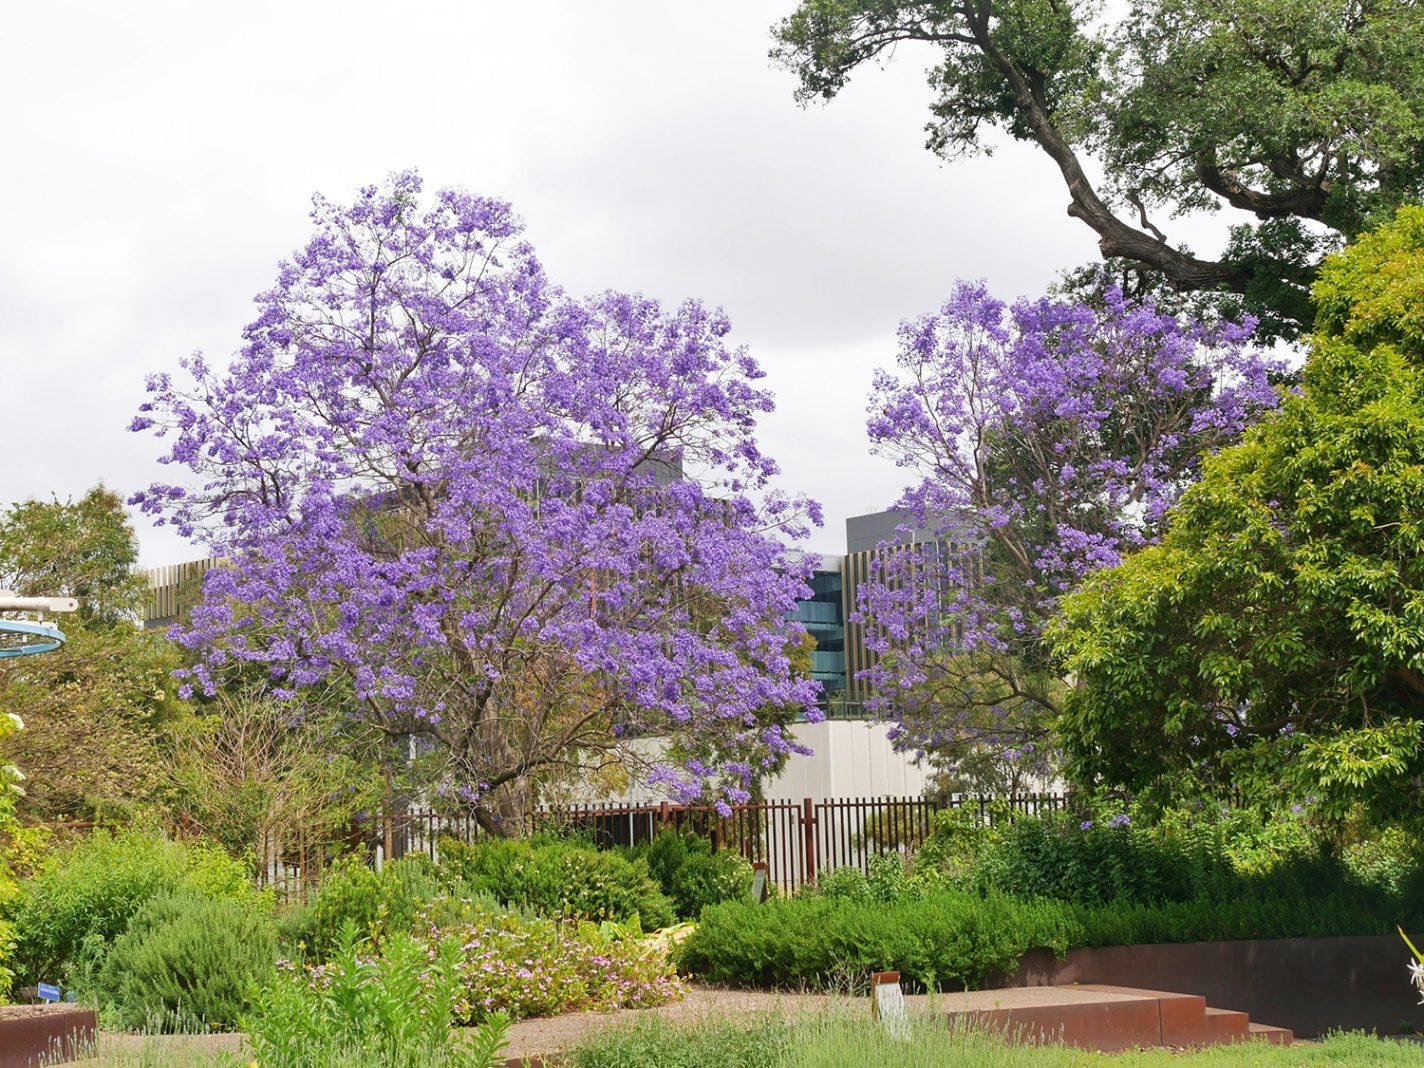 De bomen staan mooi in bloei